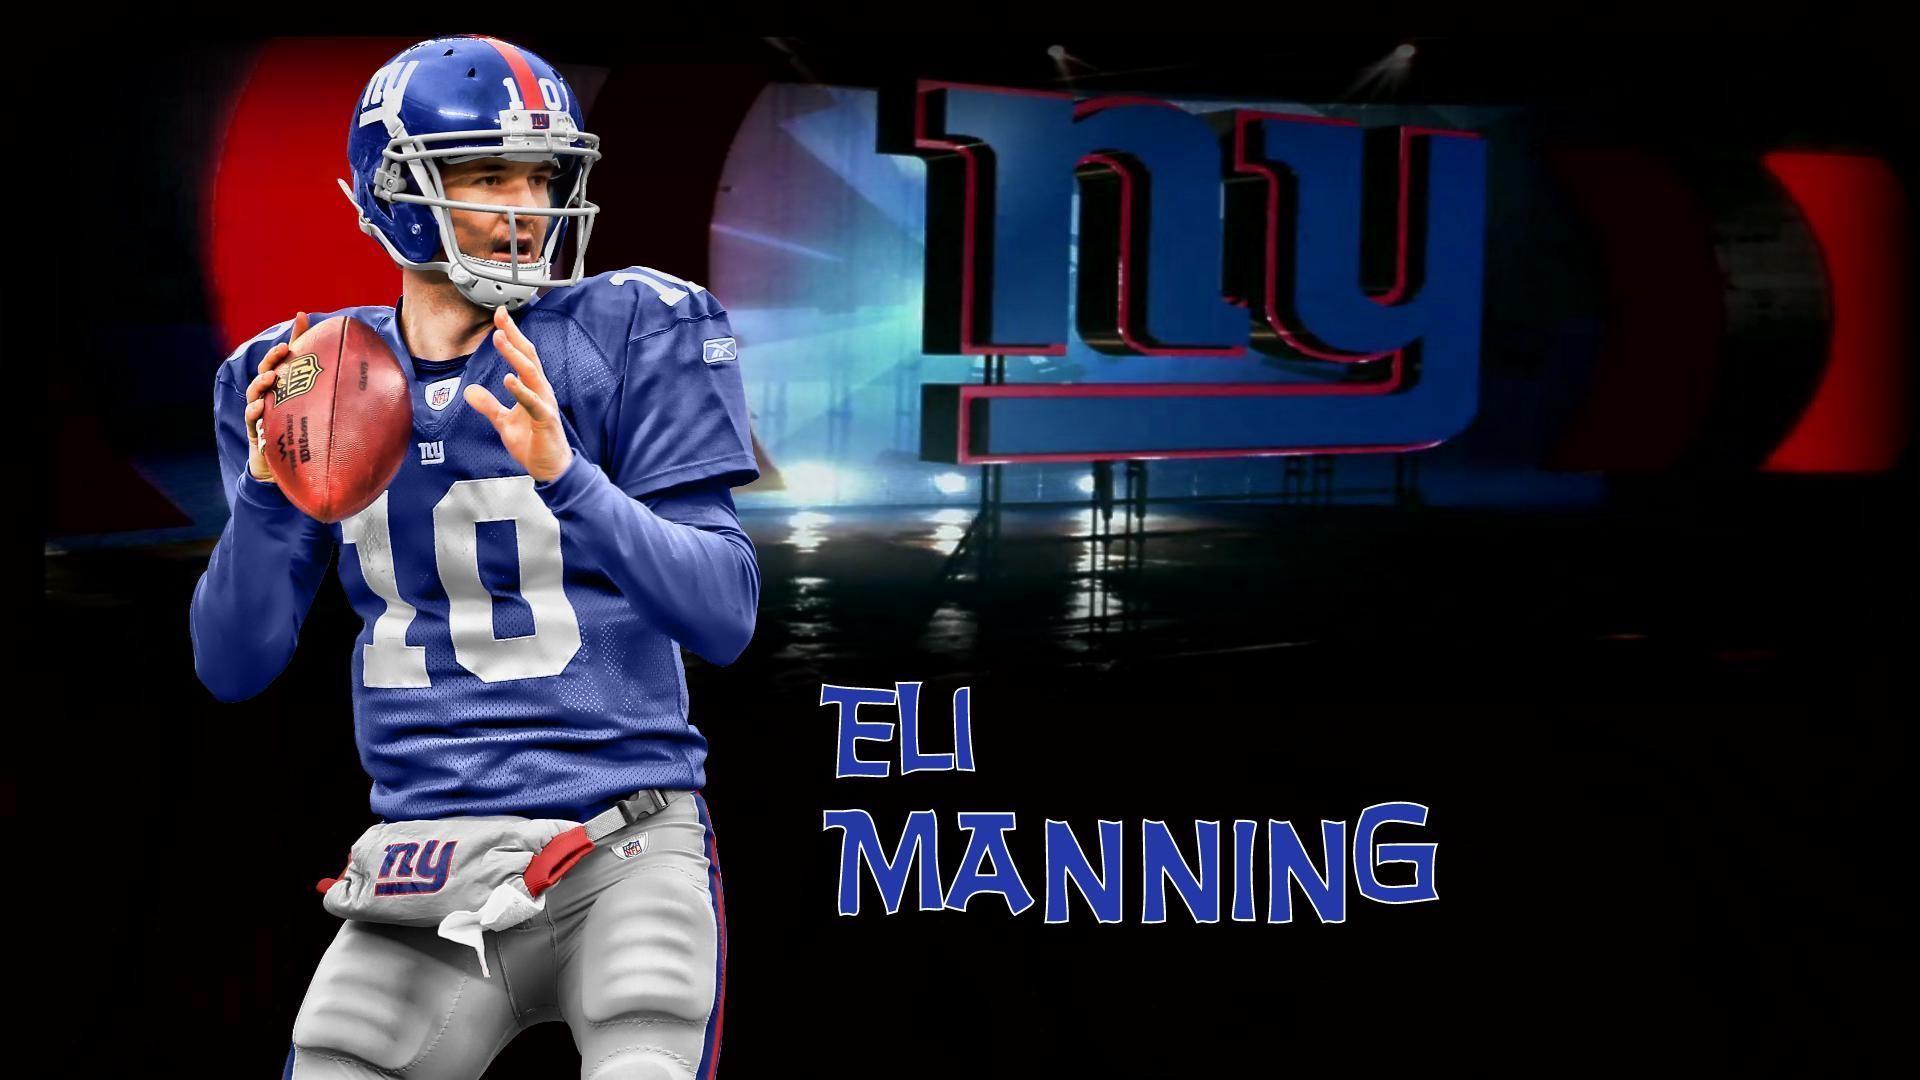 wallpaper.wiki-Eli-Manning-Wallpapers-HD-Free-Download-